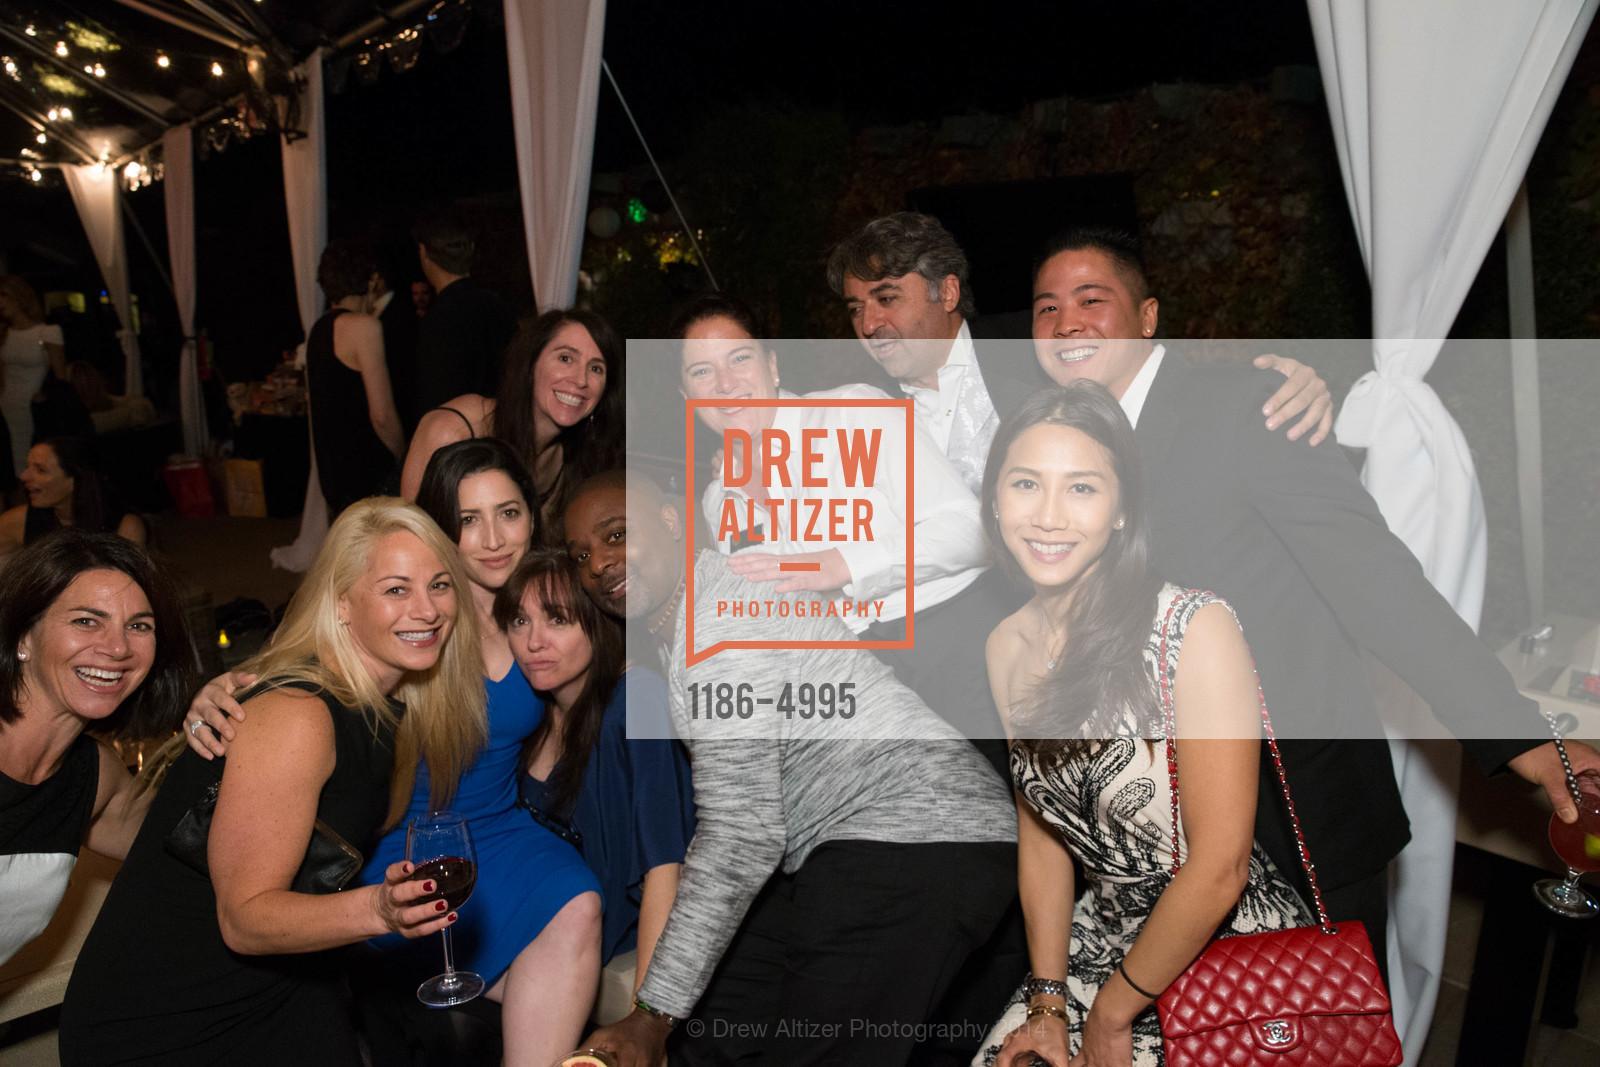 Erin Kahn, Sarah Clark, Marcus Osborn, Hooman Khalili, Bryn Nguyen, Photo #1186-4995